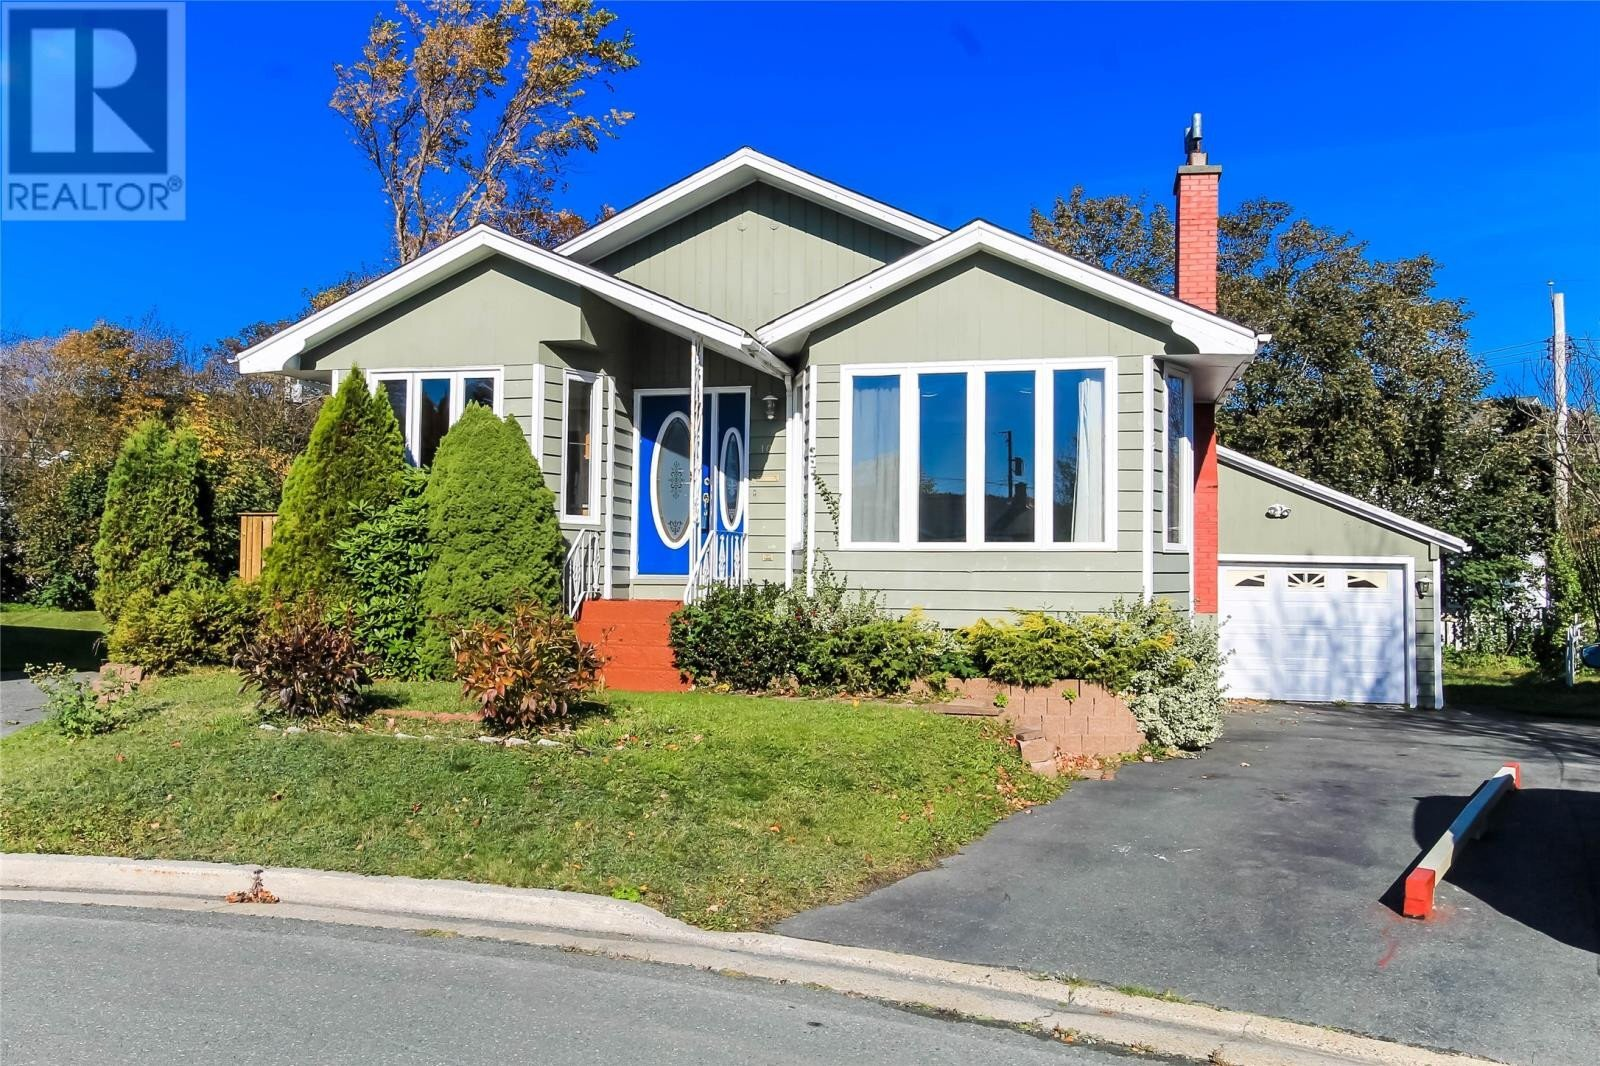 House for sale at 10 Ayrshire Pl St. John's Newfoundland - MLS: 1222881